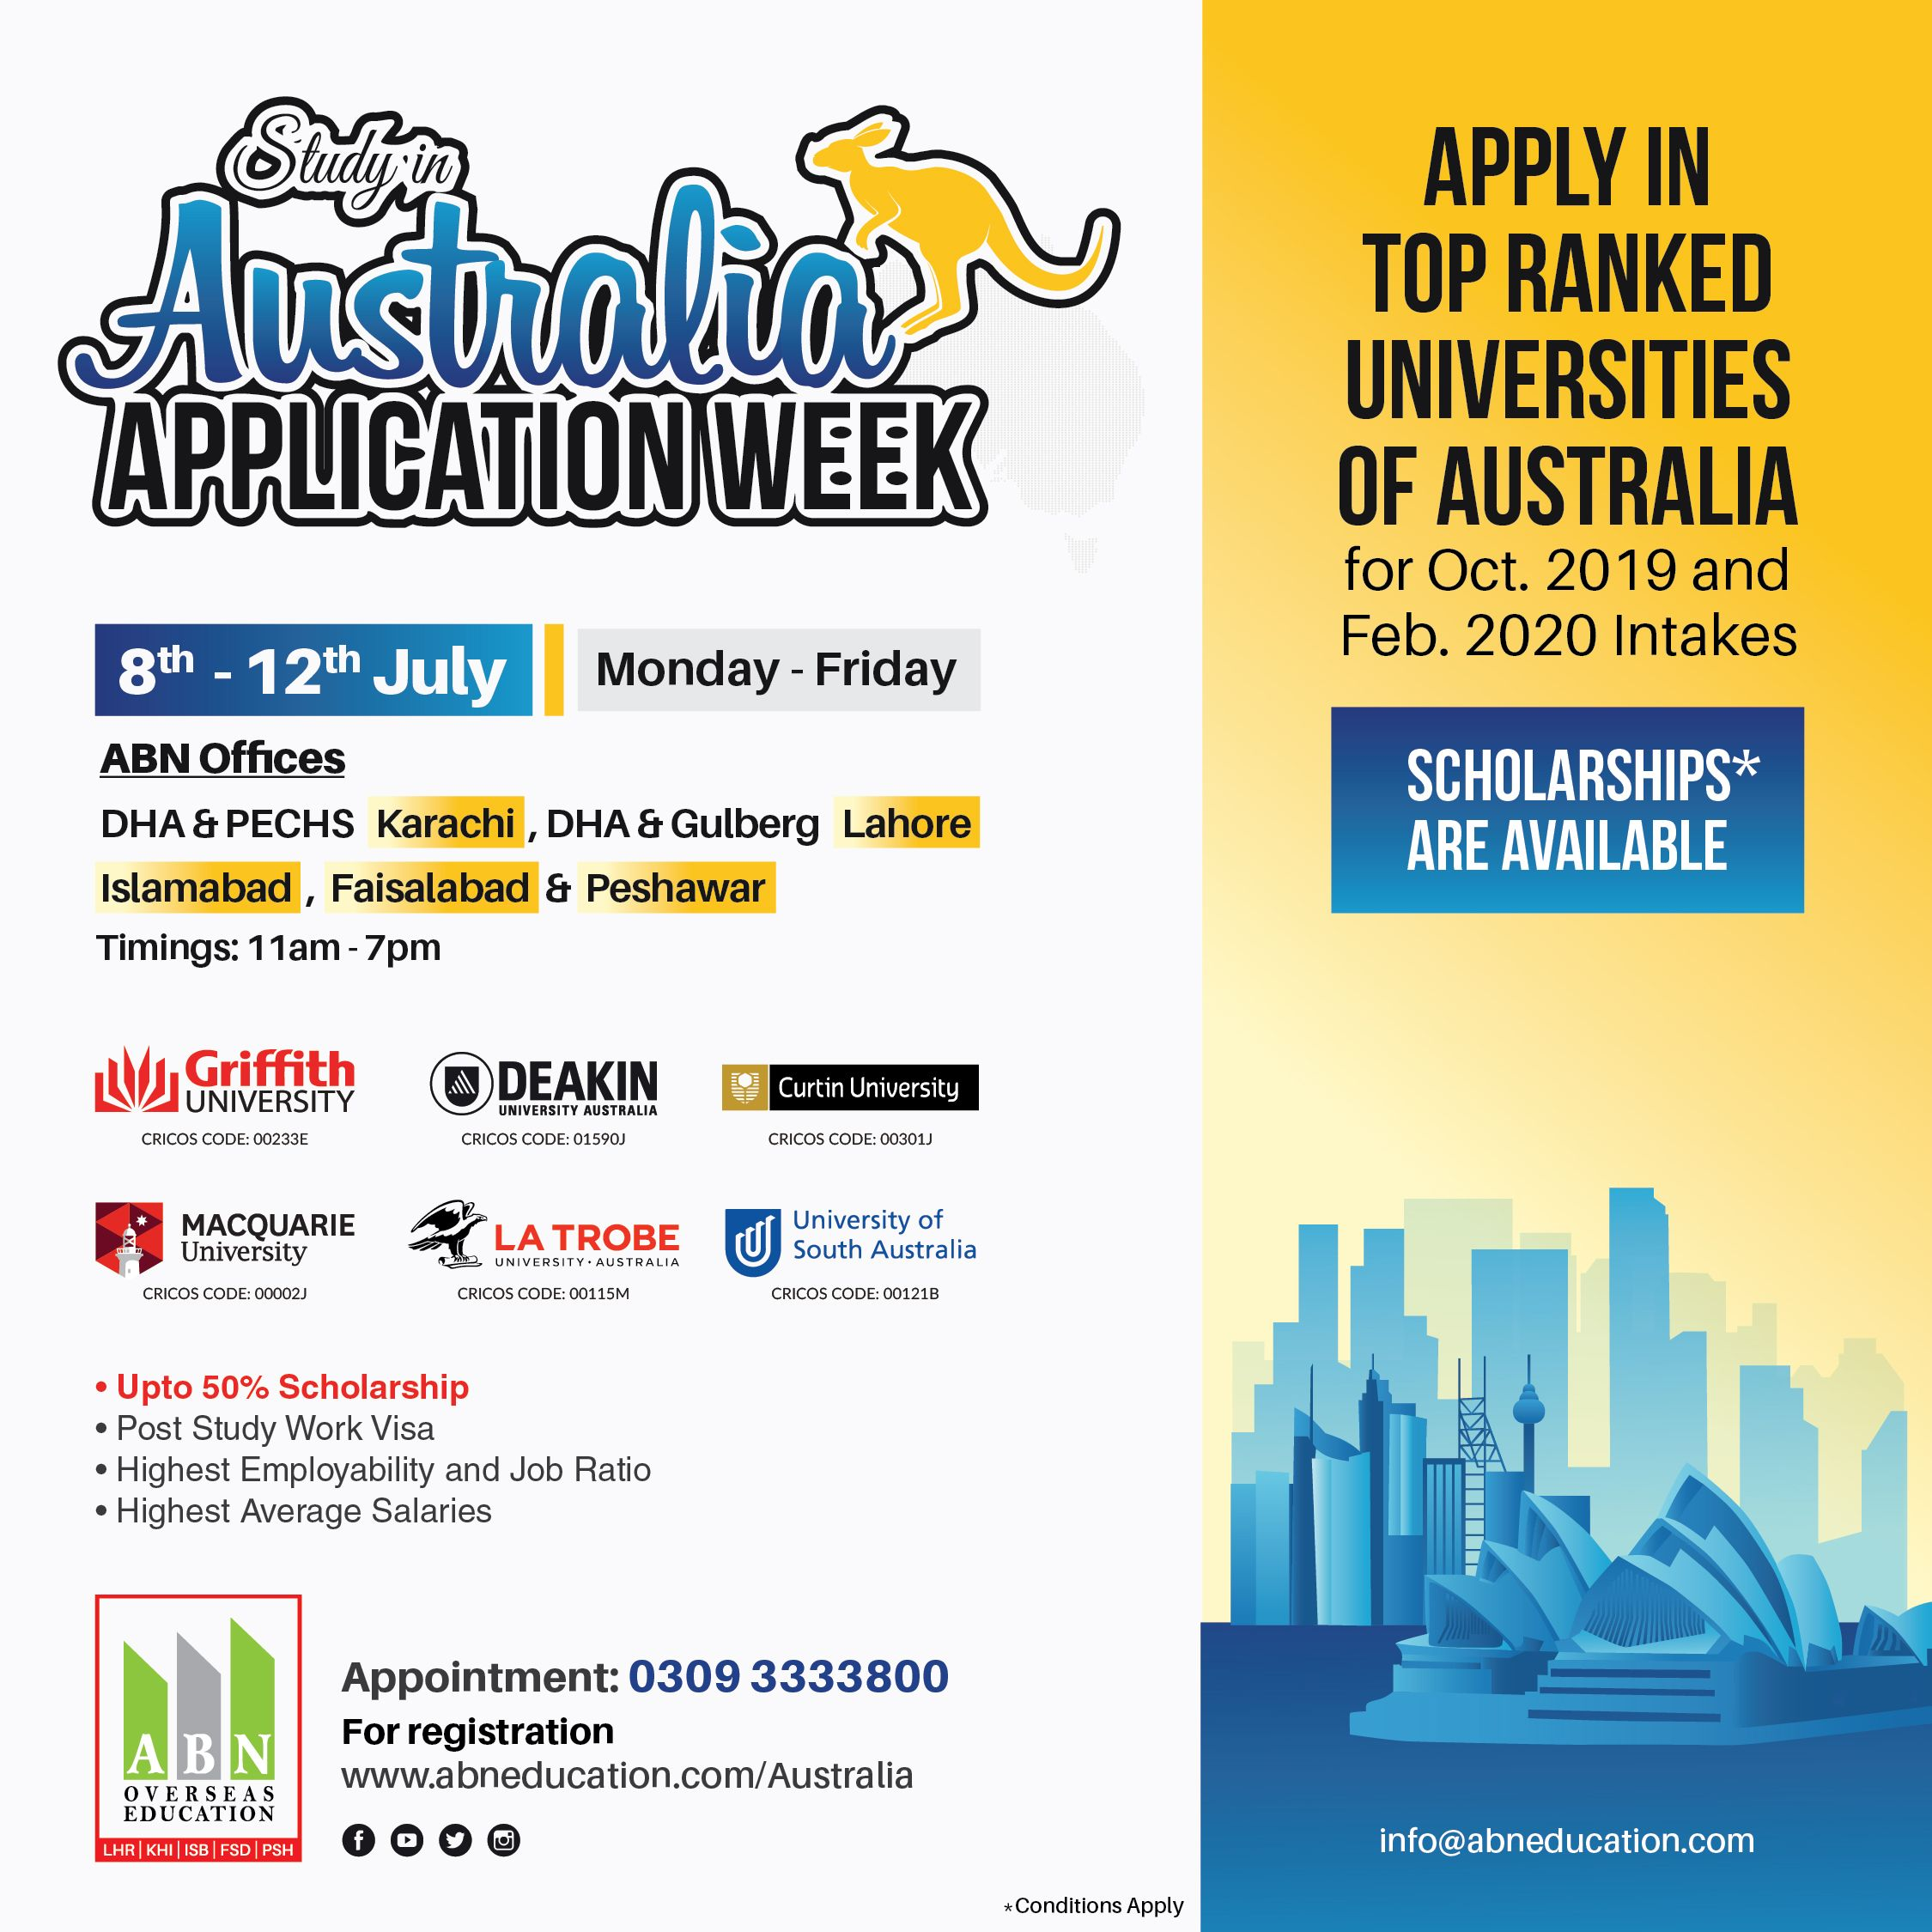 6aeaaee12a043b5f21521bc363af6523 - Australian University Application Deadline 2020